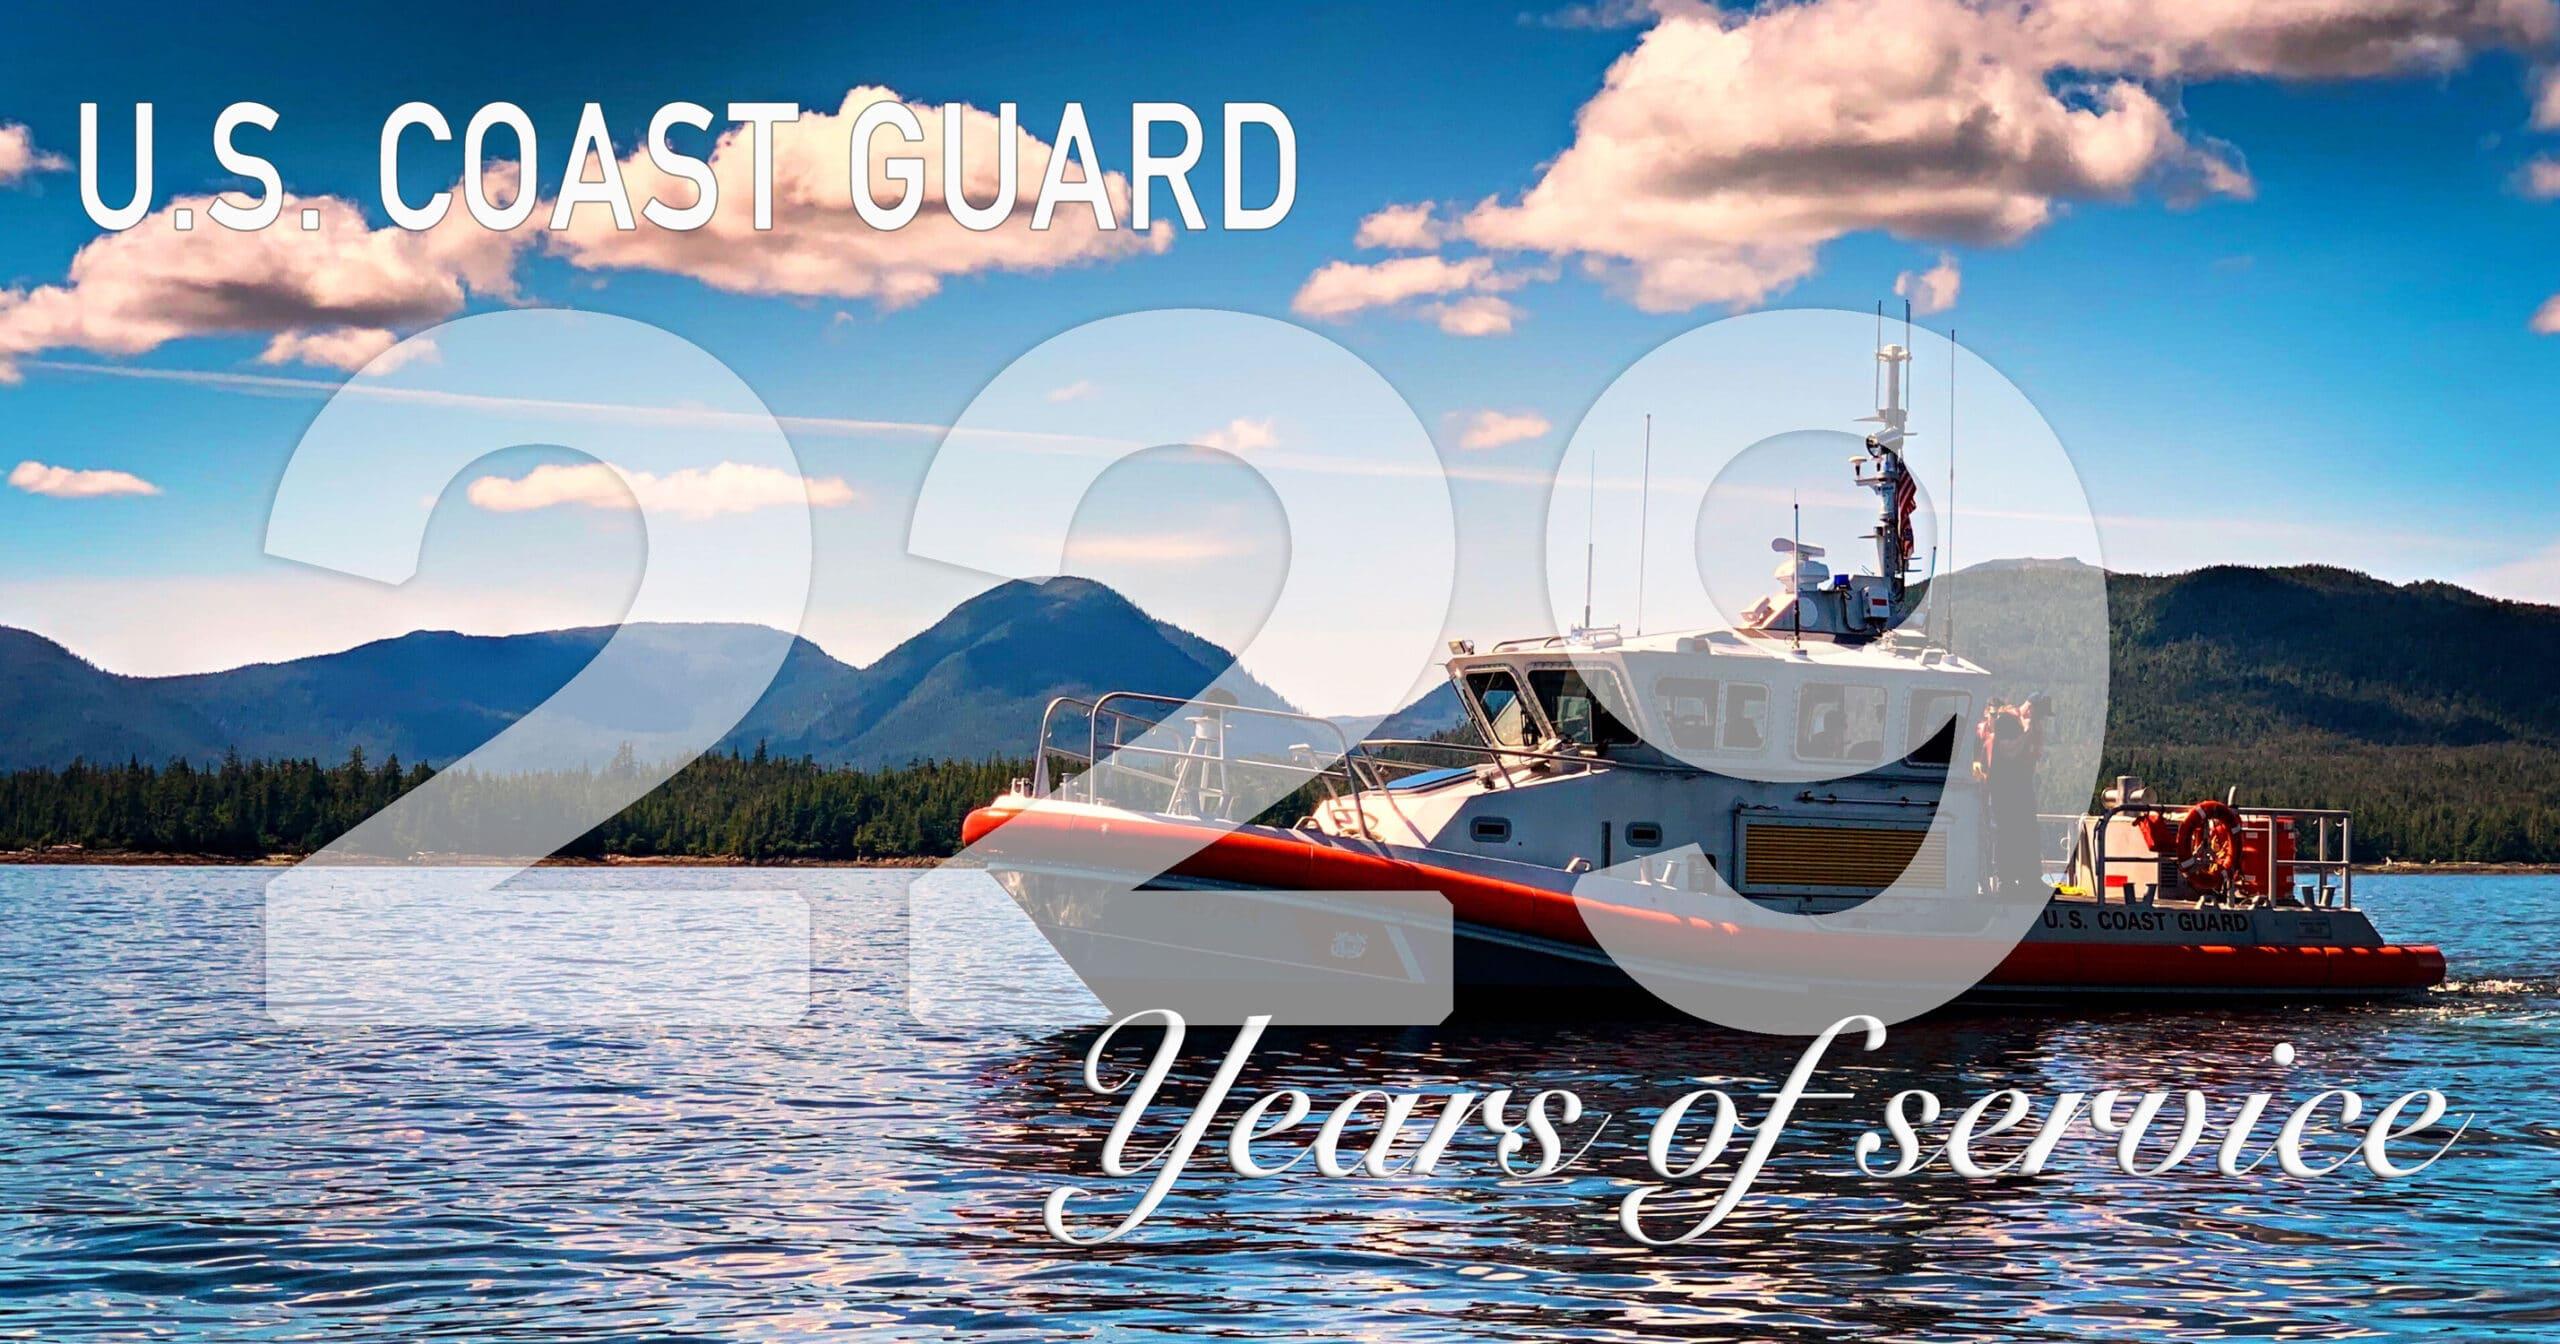 Coast Guard - 229 Years of Service